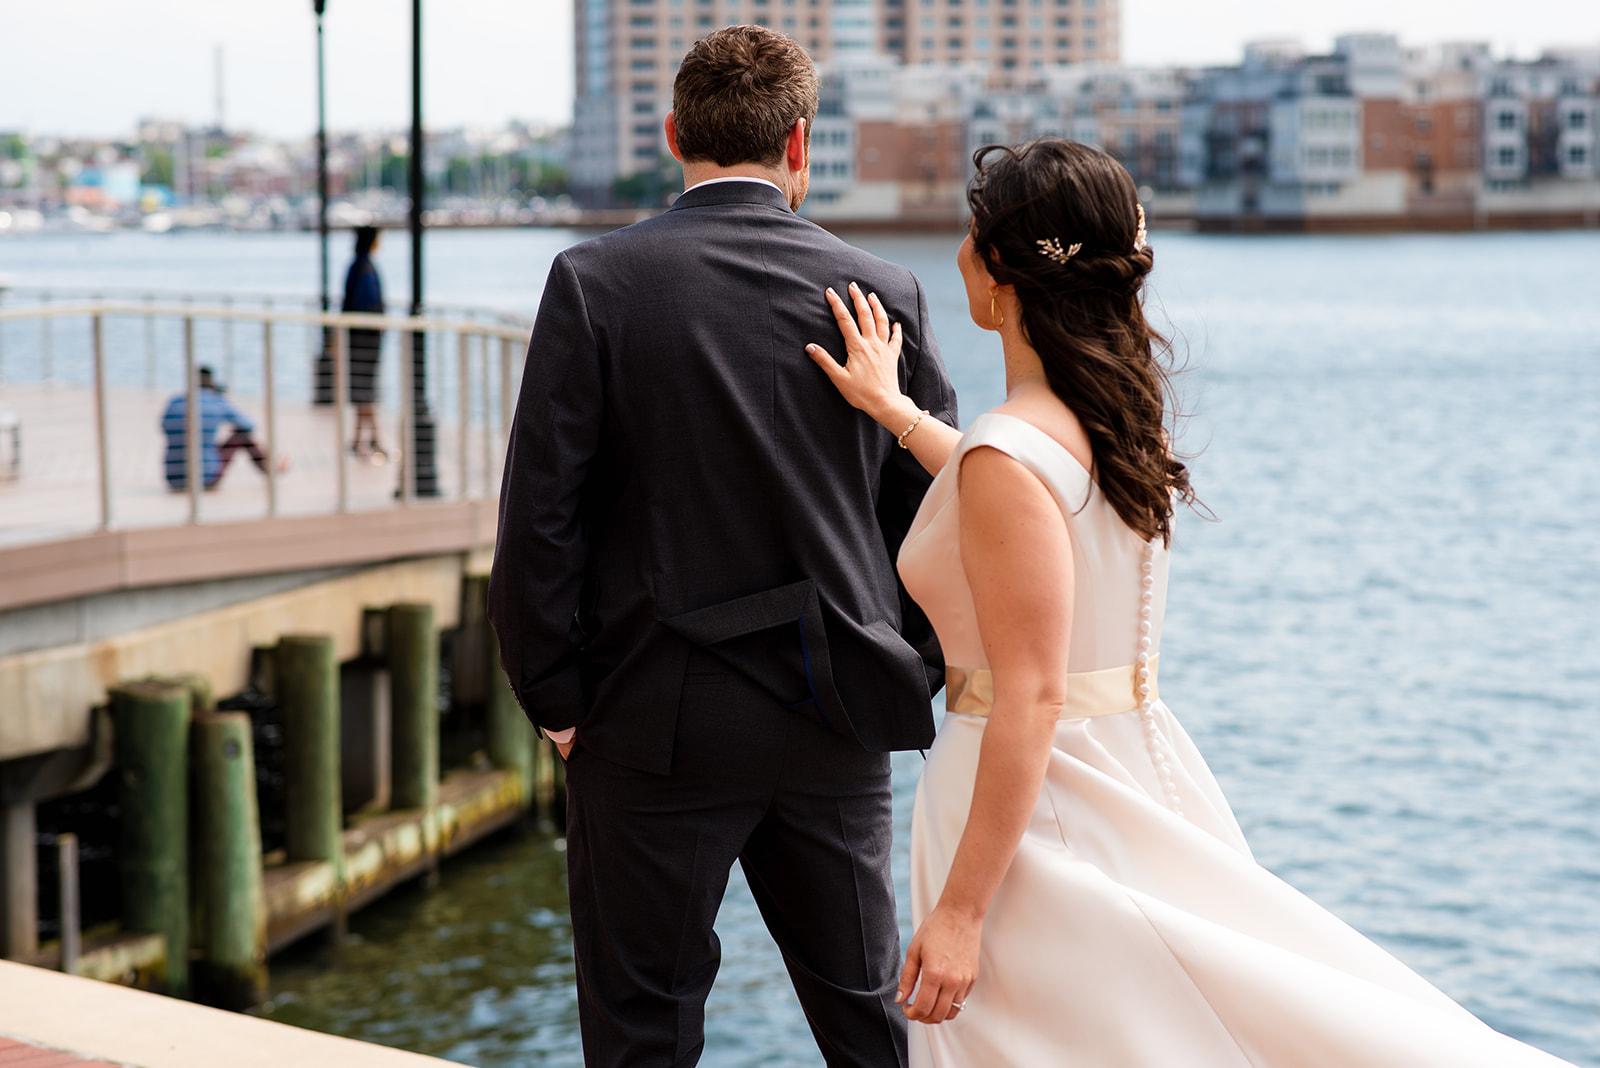 The_best_of_the_best_wedding_photographer_Mantas_Kubilinskas-214.jpg